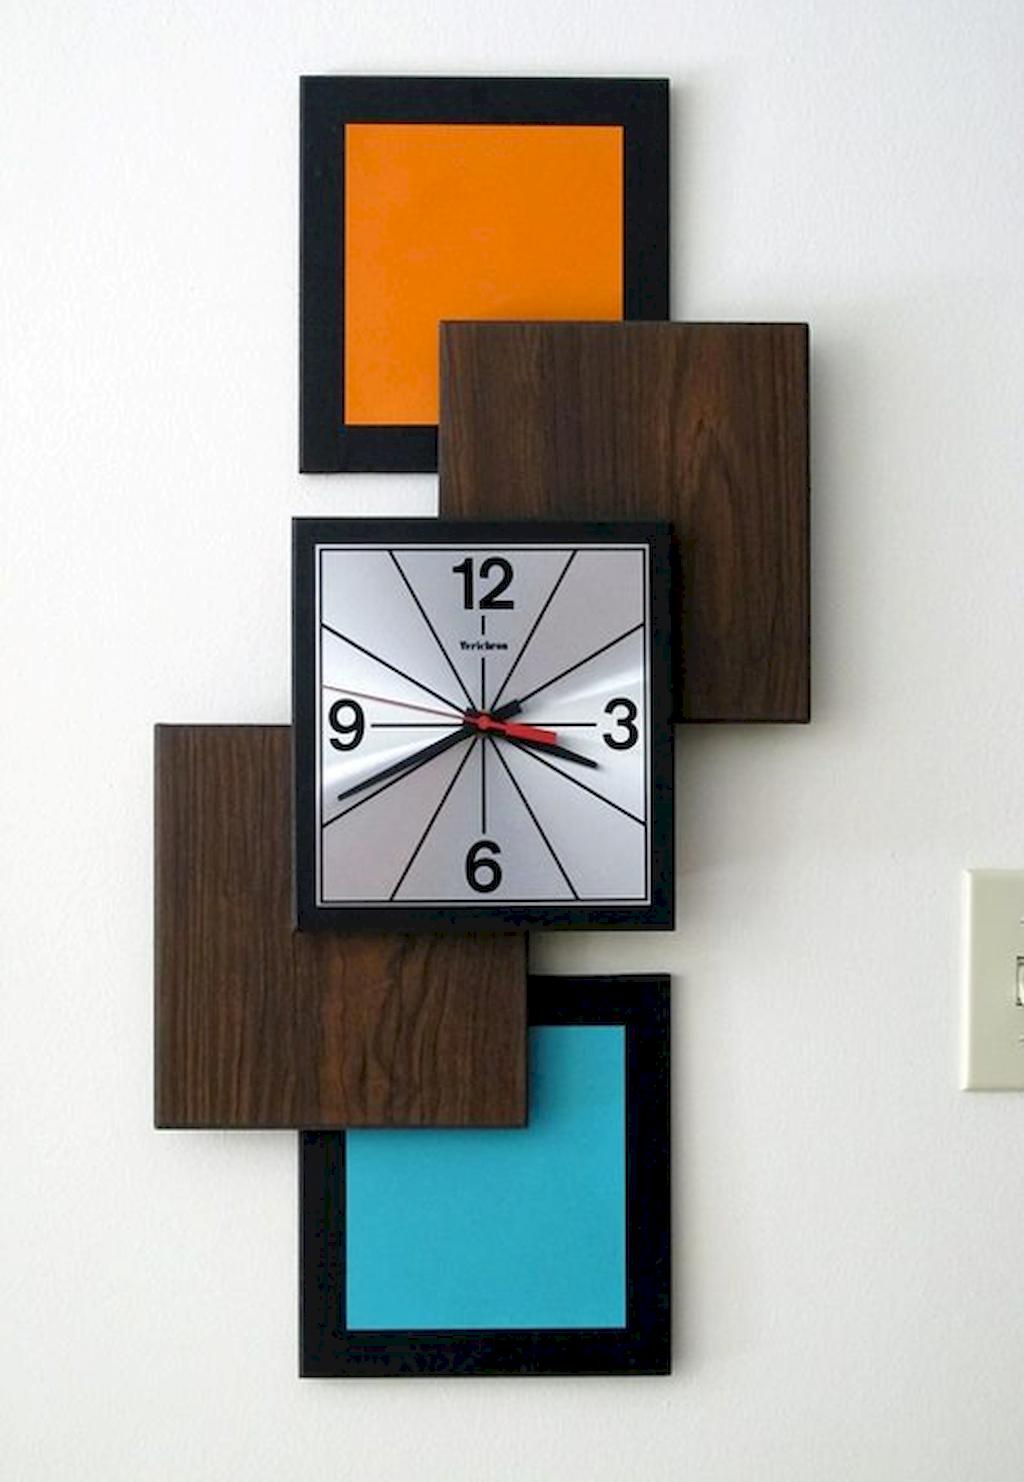 Modern Wall Clocks Mekkanico 052 Modern Round Wall Clock In Natural Color Relojes De Pared Originales Relojes De Pared Relojes De Madera